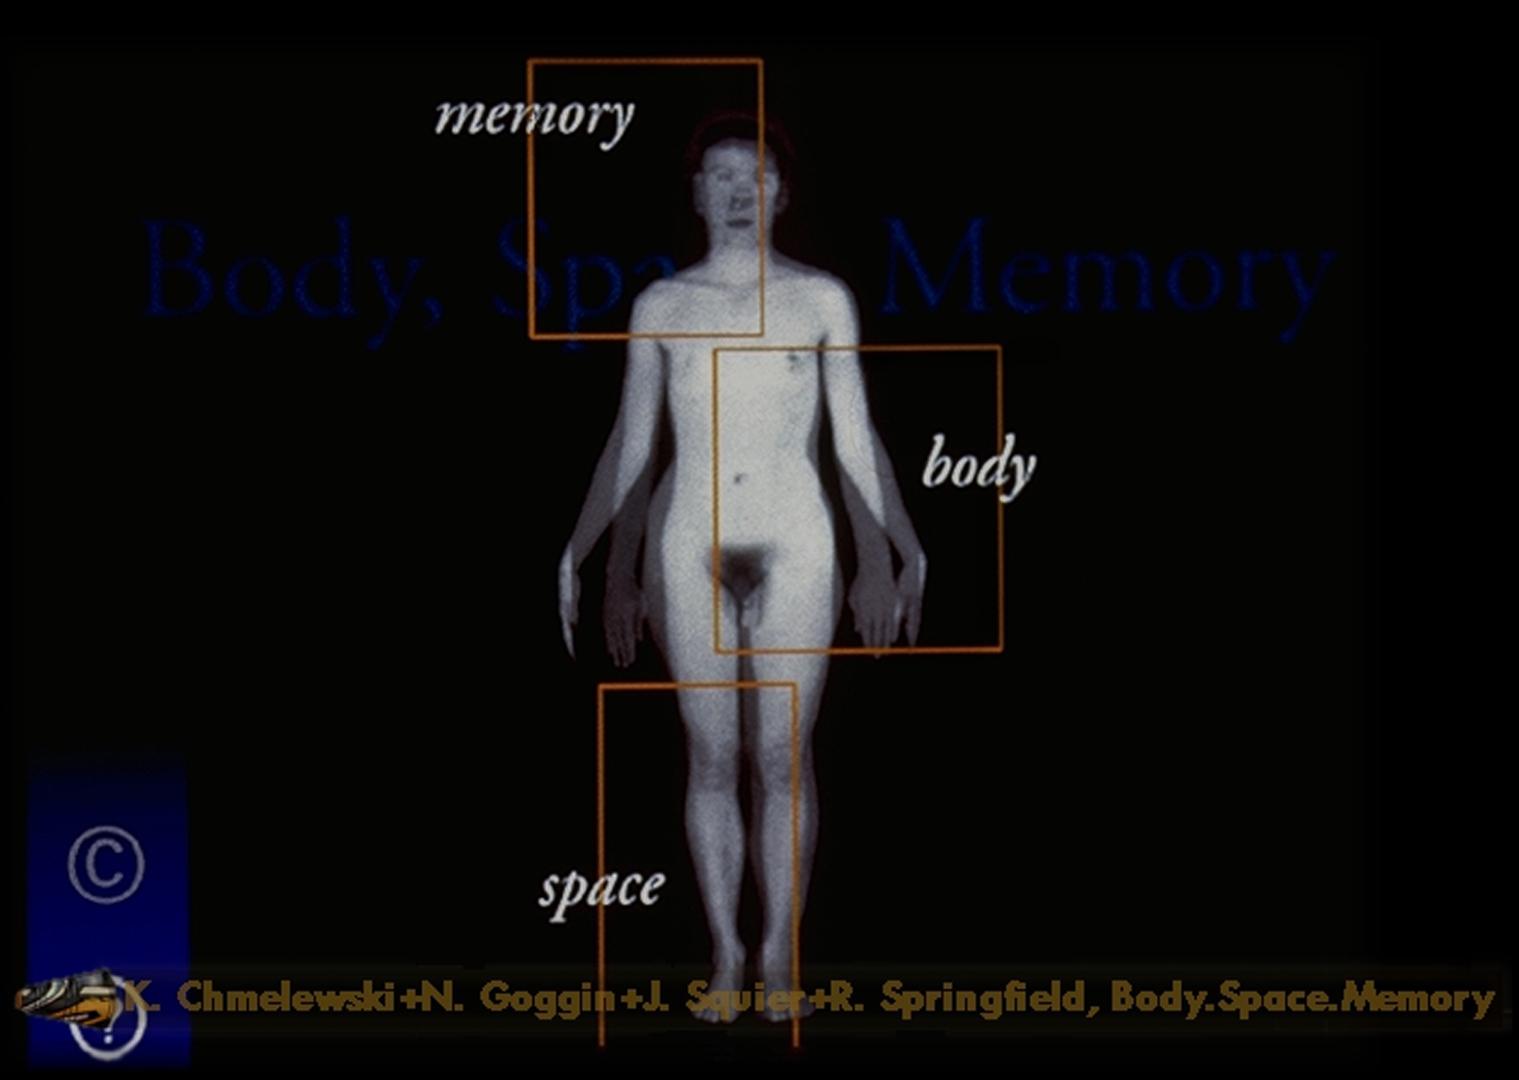 ©, Kathleen Chmelewski, Nan Goggin, Joseph Squier, and Robb Springfield, Body, Space, Memory